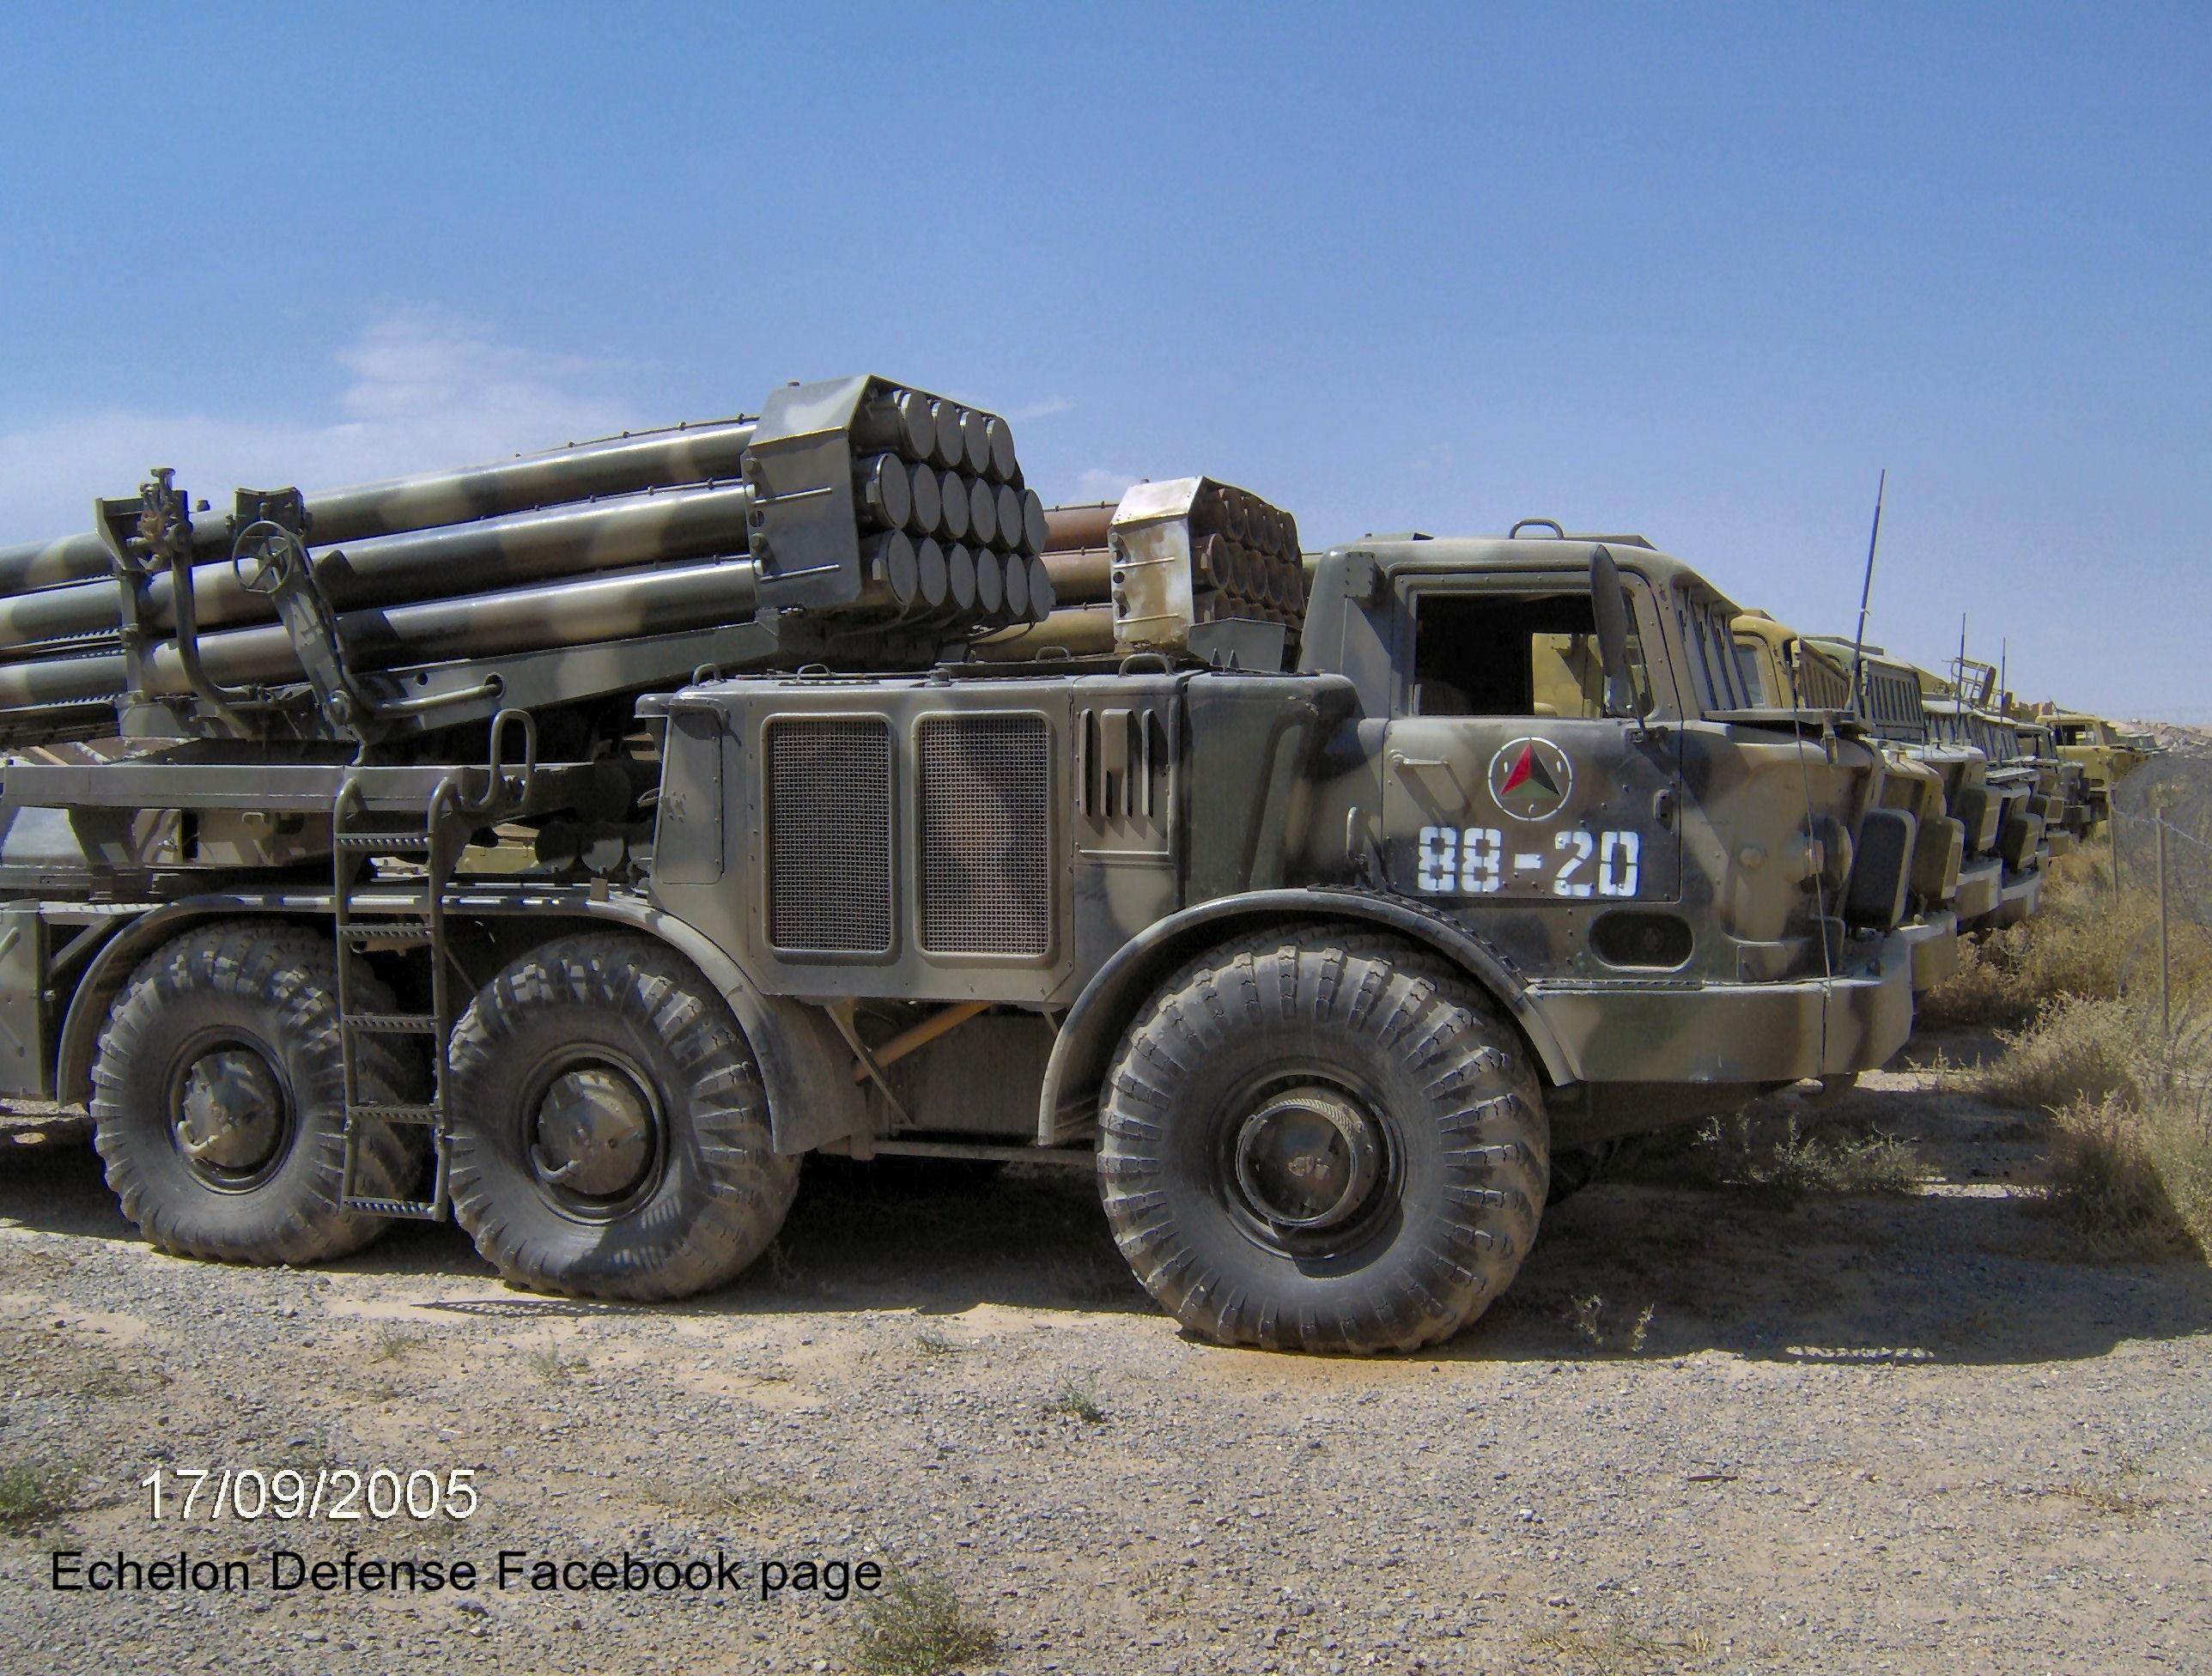 Russian MRLS: Grad, Uragan, Smerch, Tornado-G/S - Page 6 ZqX4OD